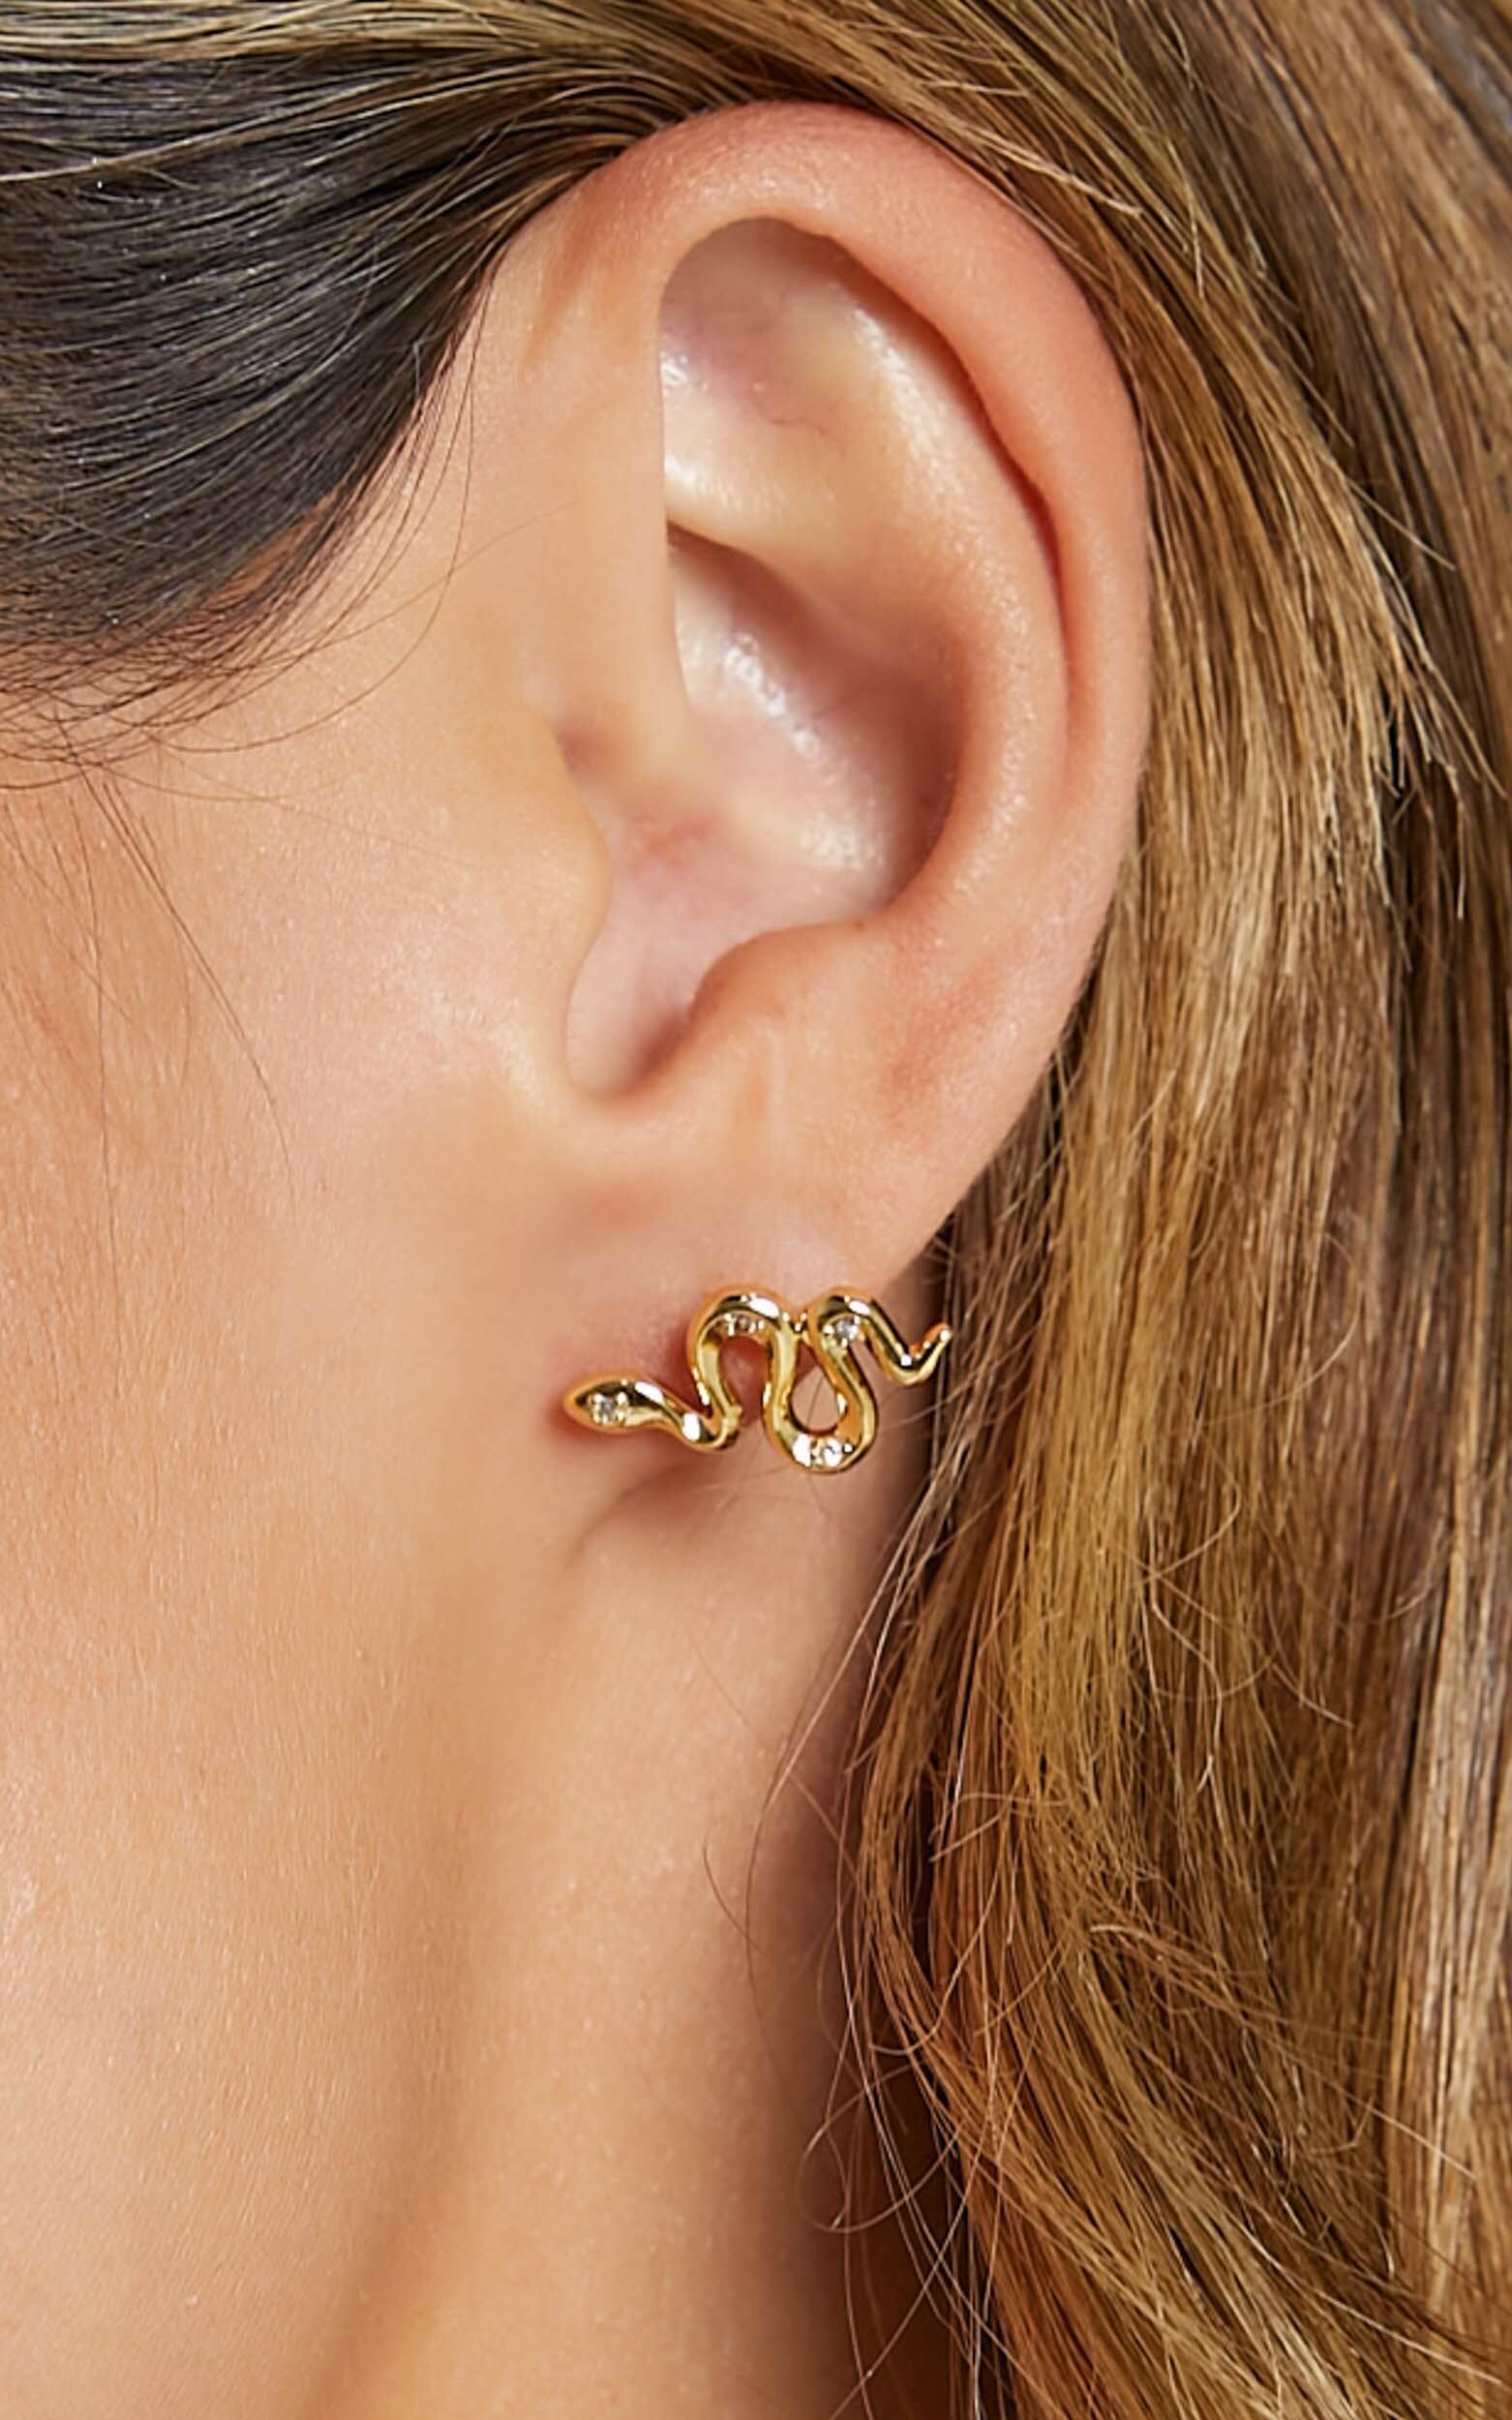 Izoa - Snake Stud Earrings in Gold, GLD1, hi-res image number null